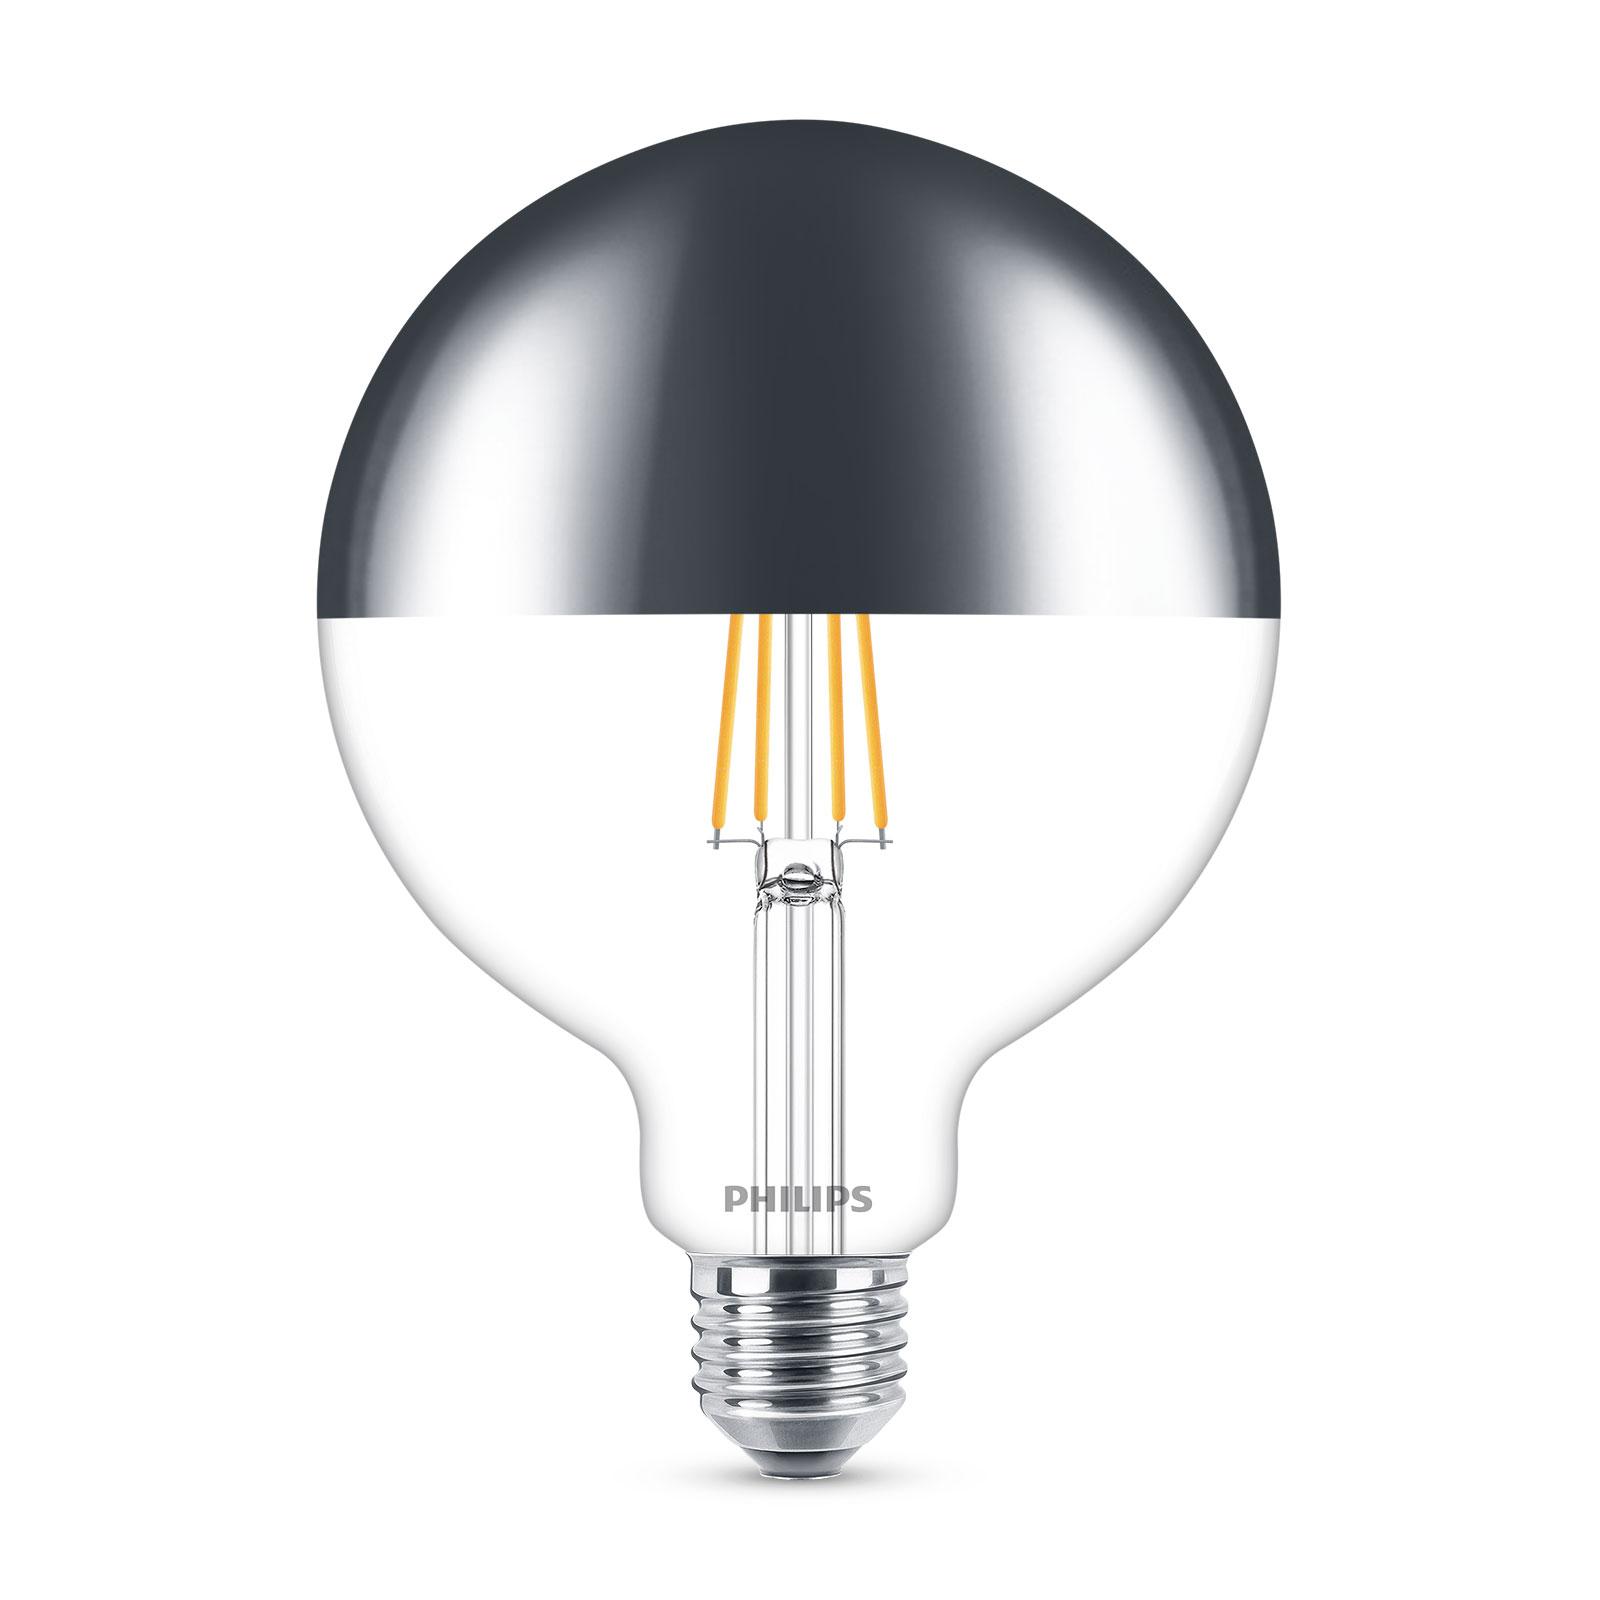 Philips LED-Globelampe E27 G120 7,2W Kopfspiegel